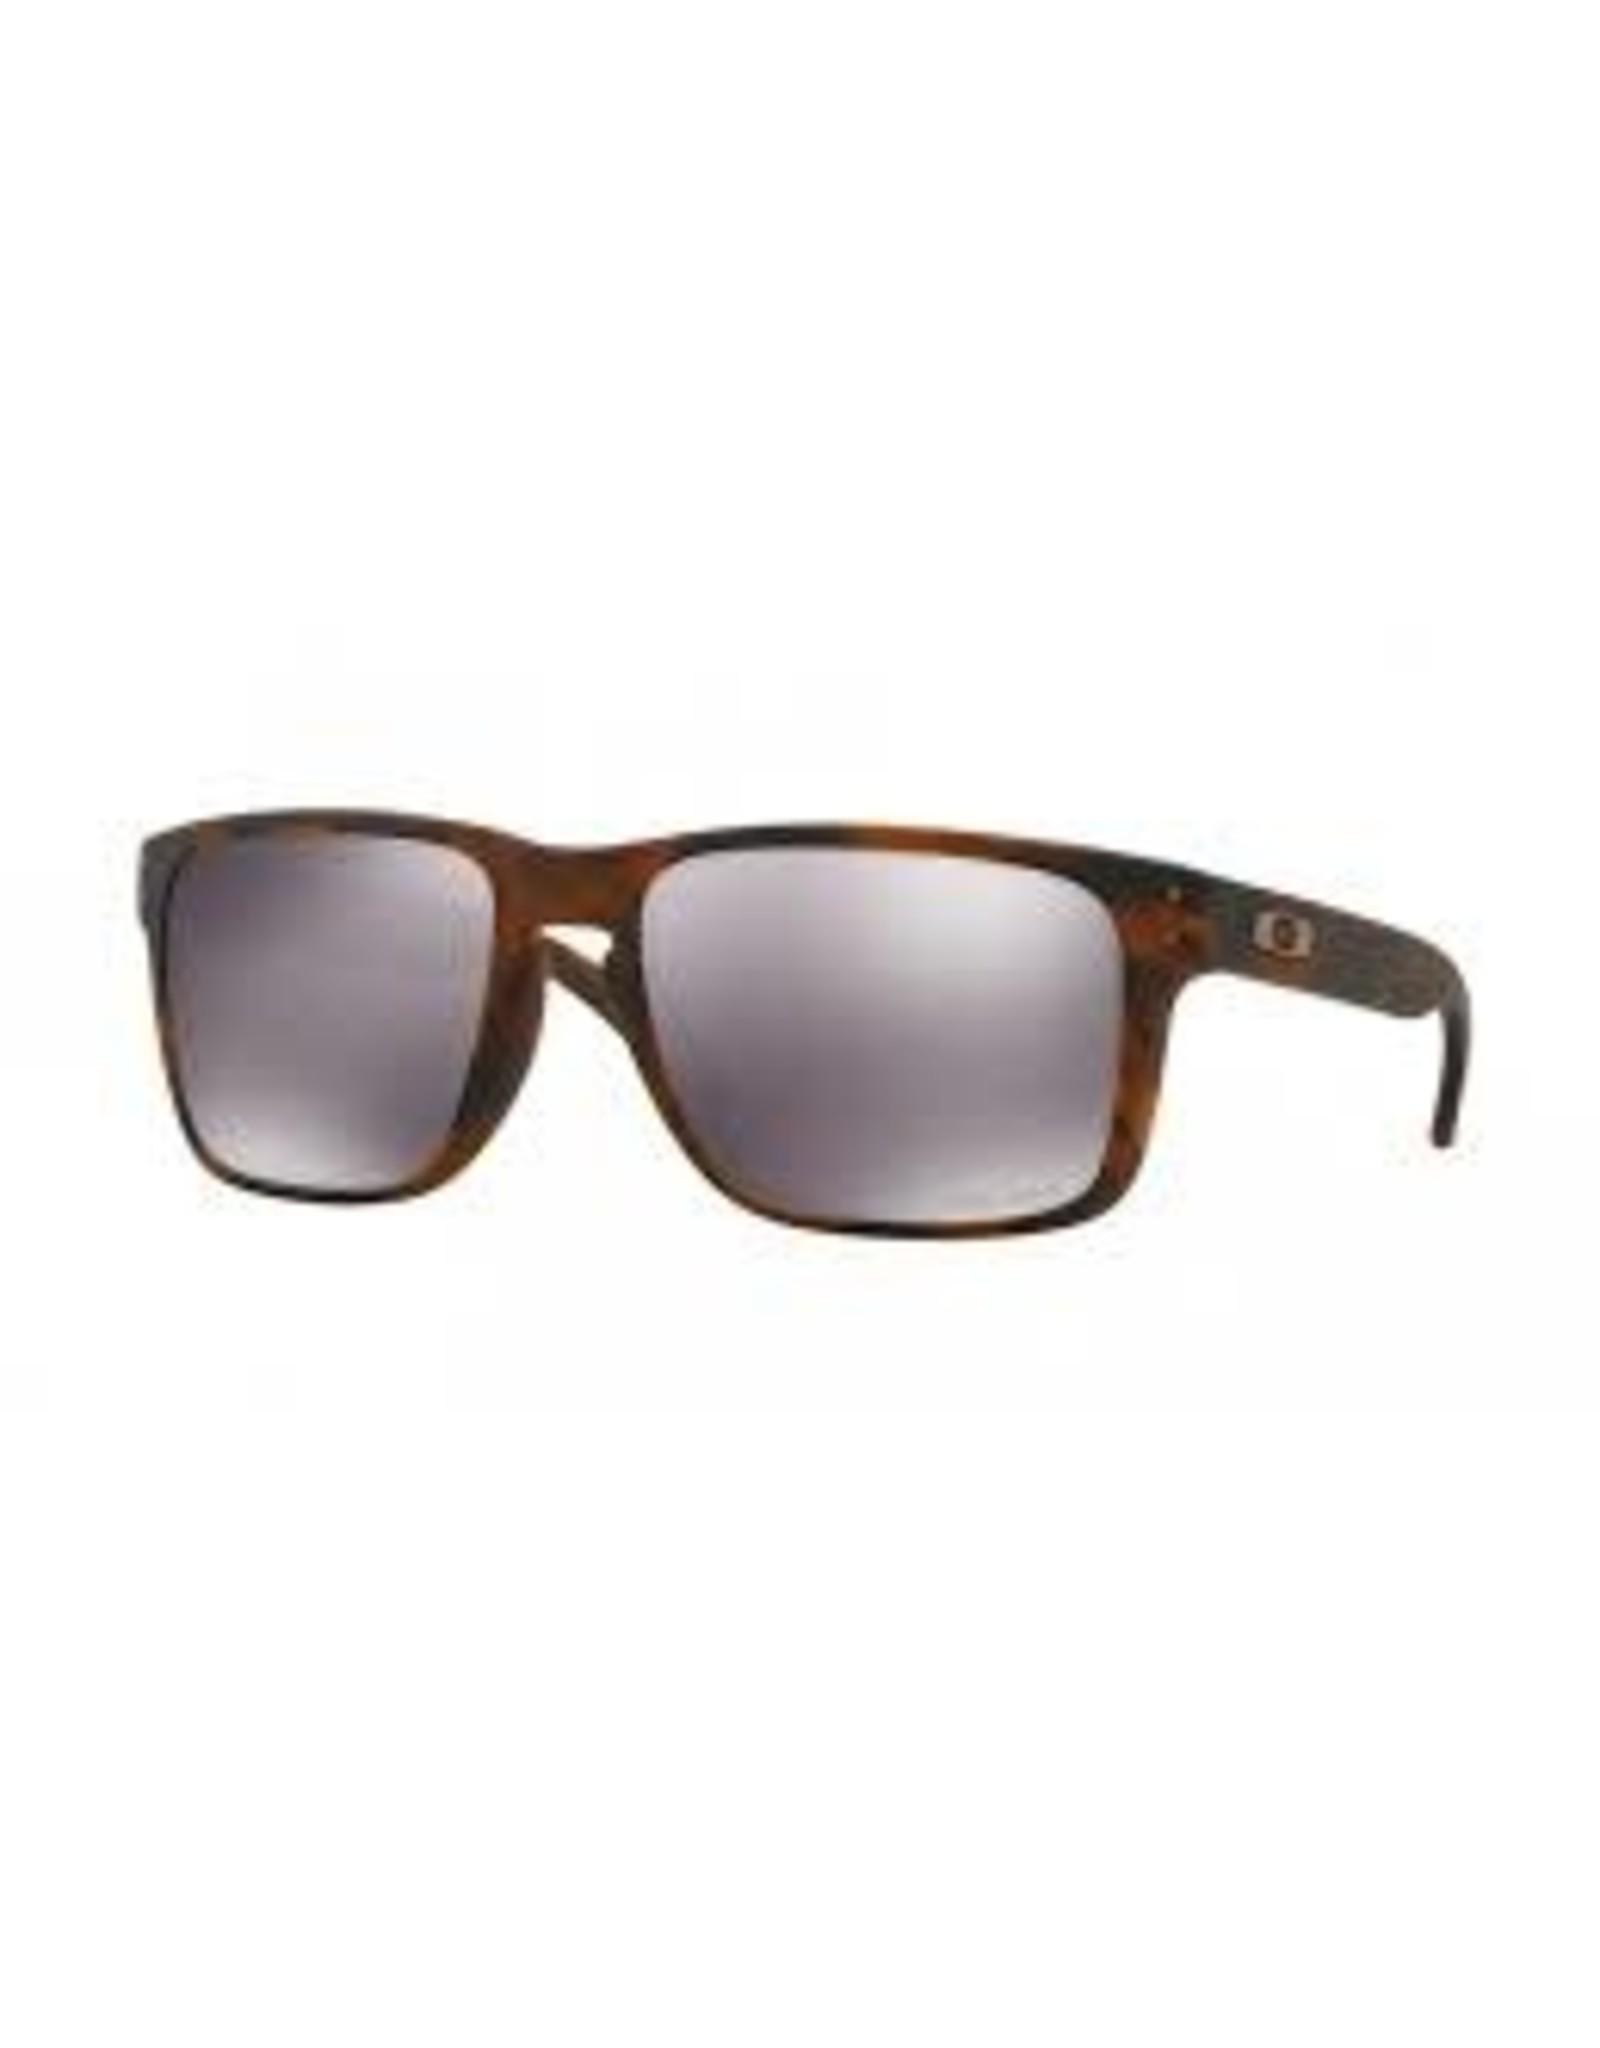 Oakley Oakley - lunette soleil holbrook xl matte brn toitoise/prizm blk iridium